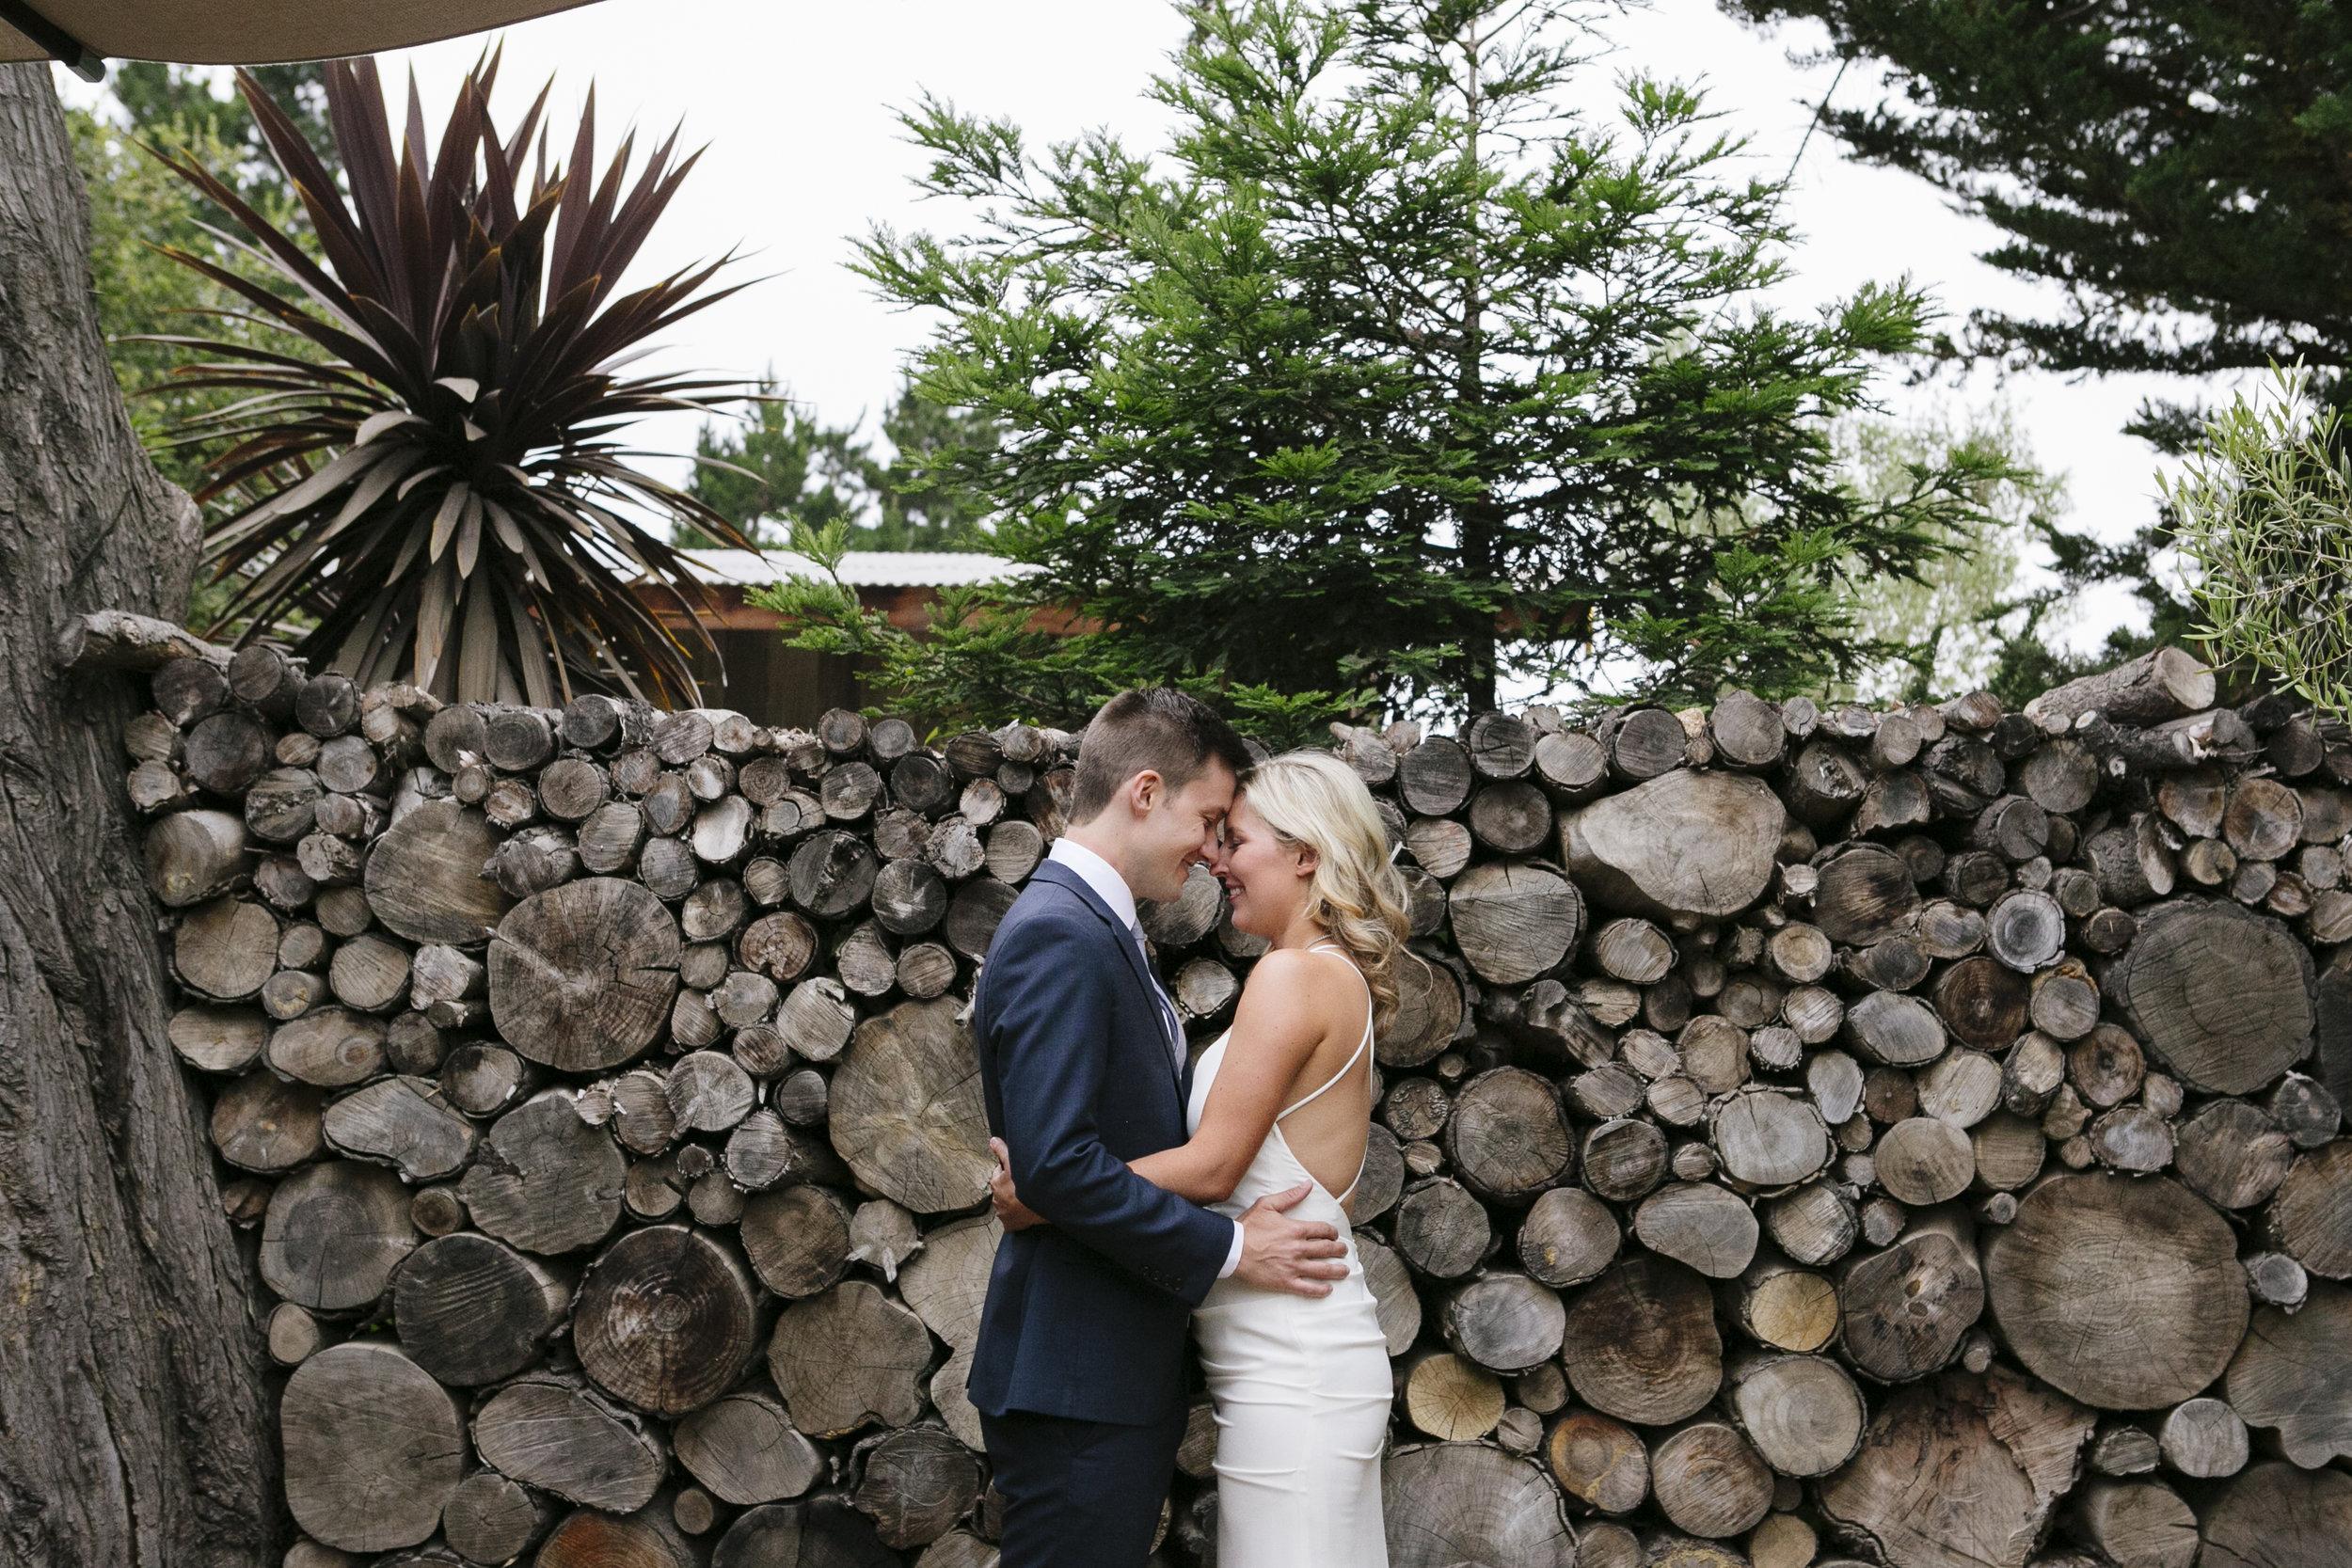 KateGarrett_WeddingPreview_KB_7466-2.jpg